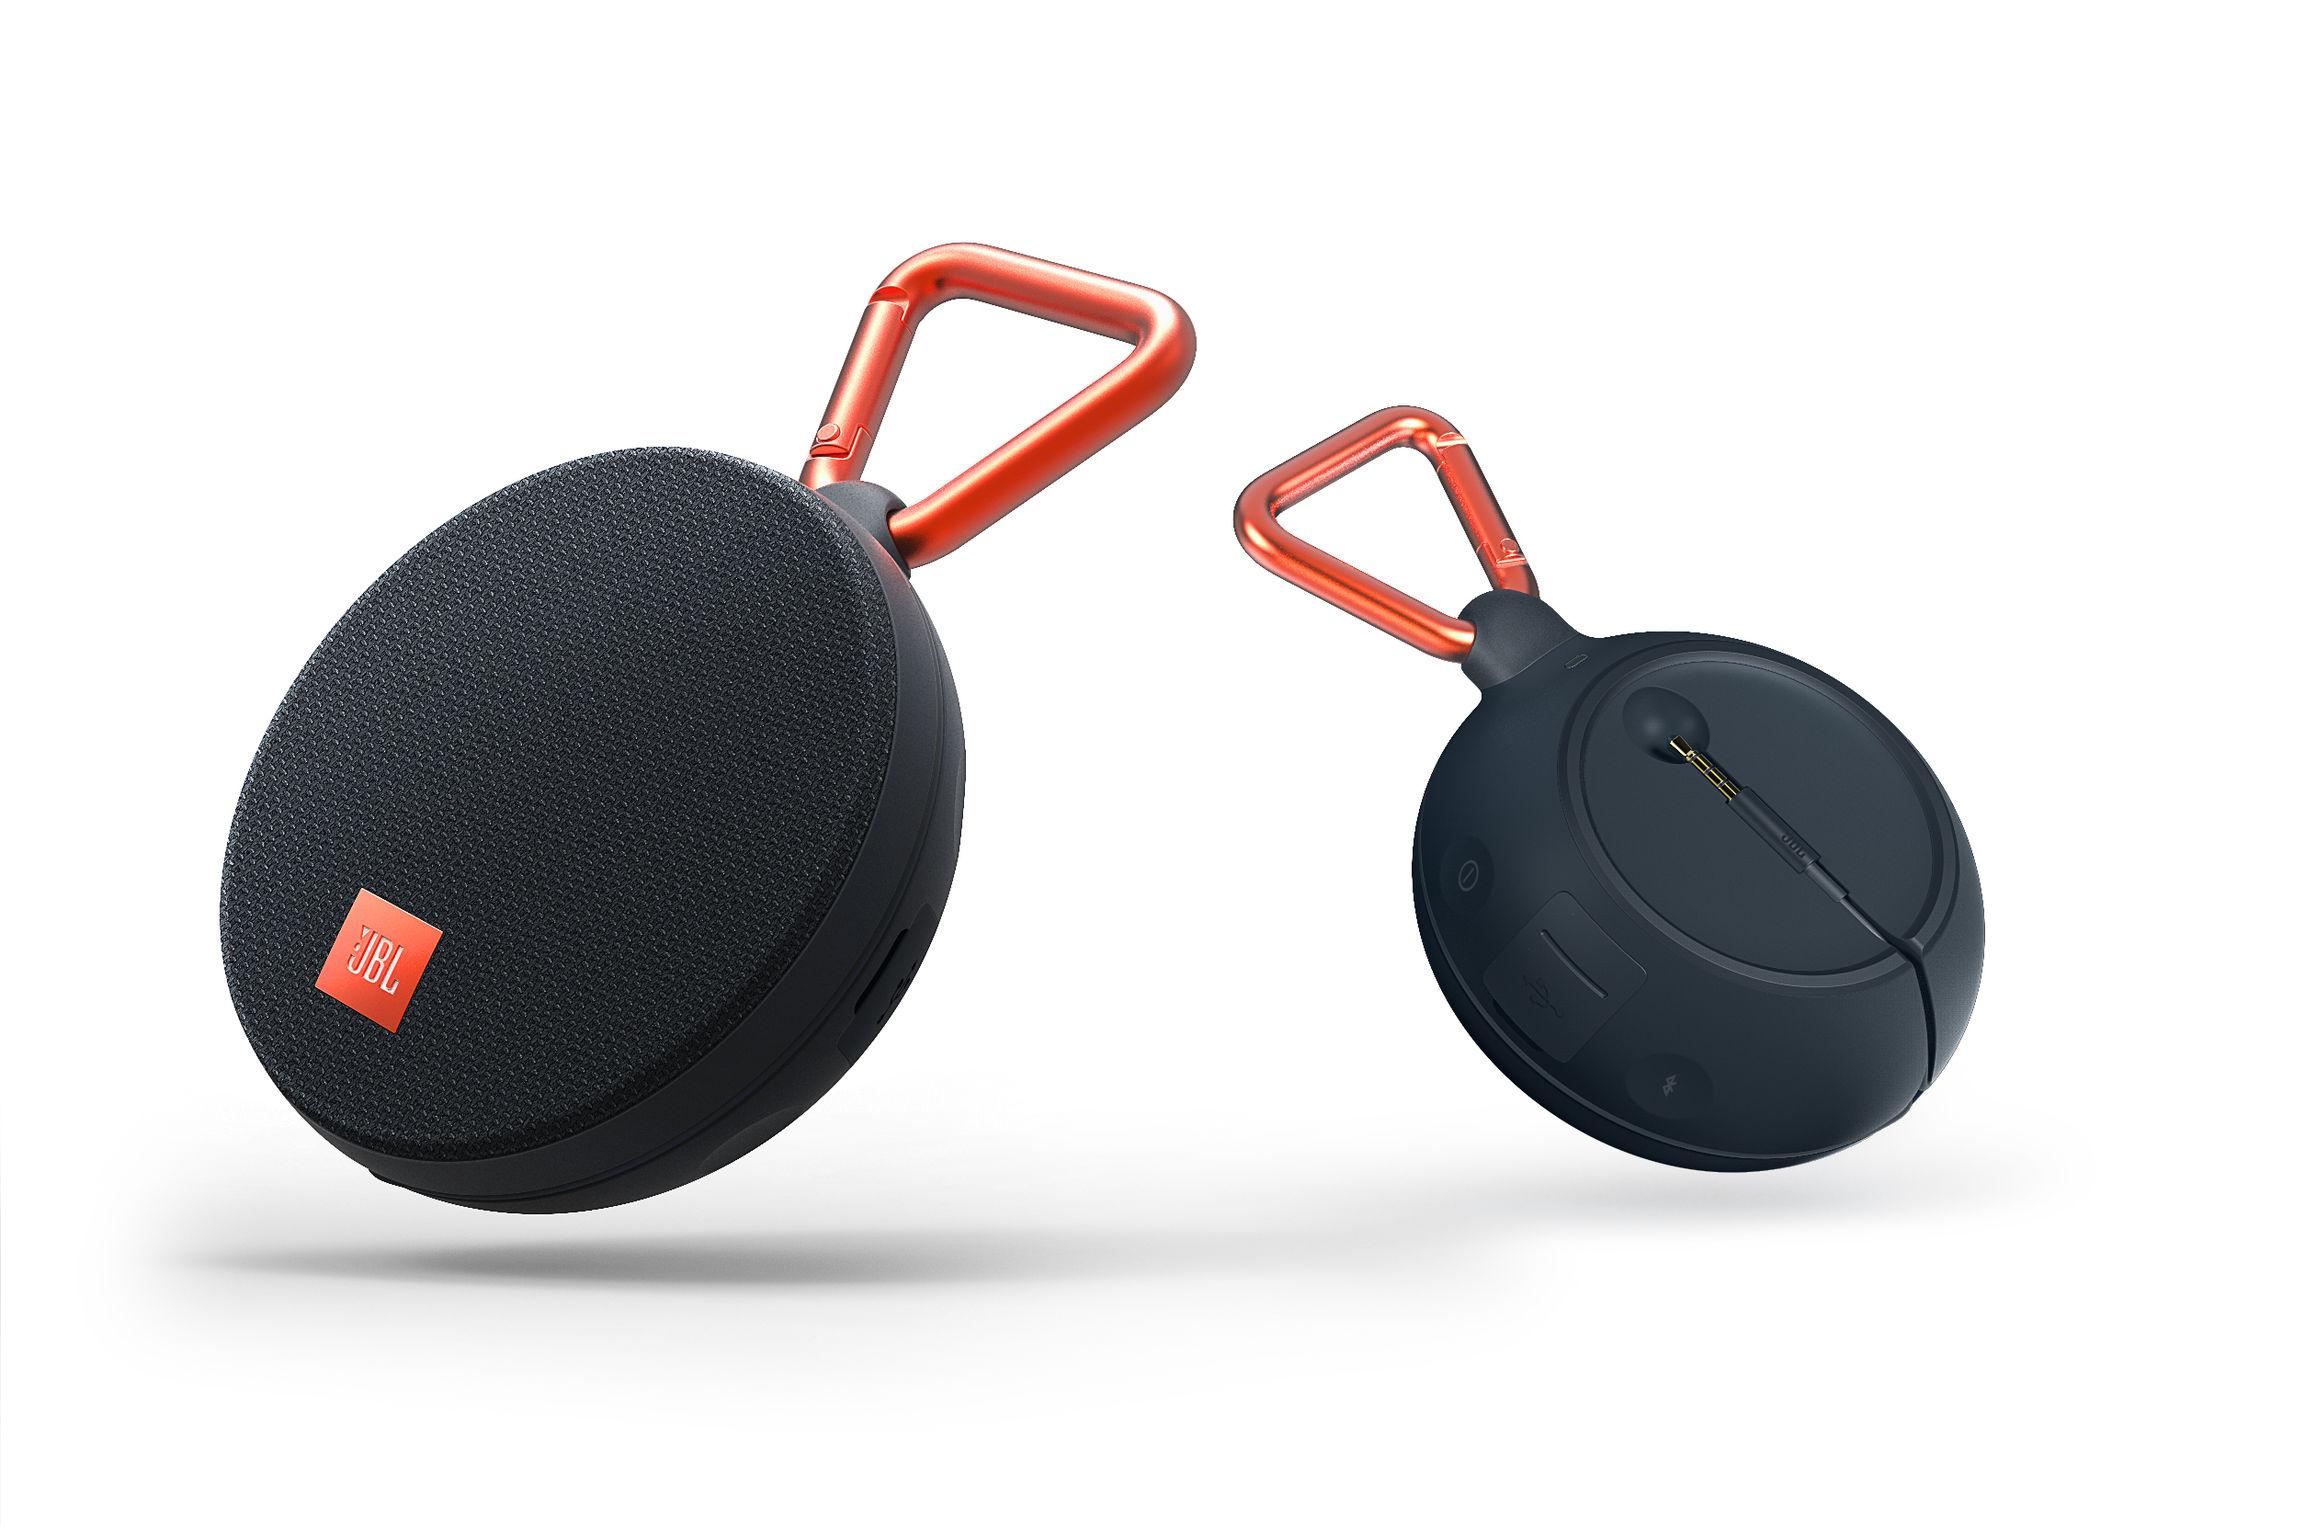 Jbl bluetooth headphones clip - Sennheiser Drops 5 'Street' Headphones